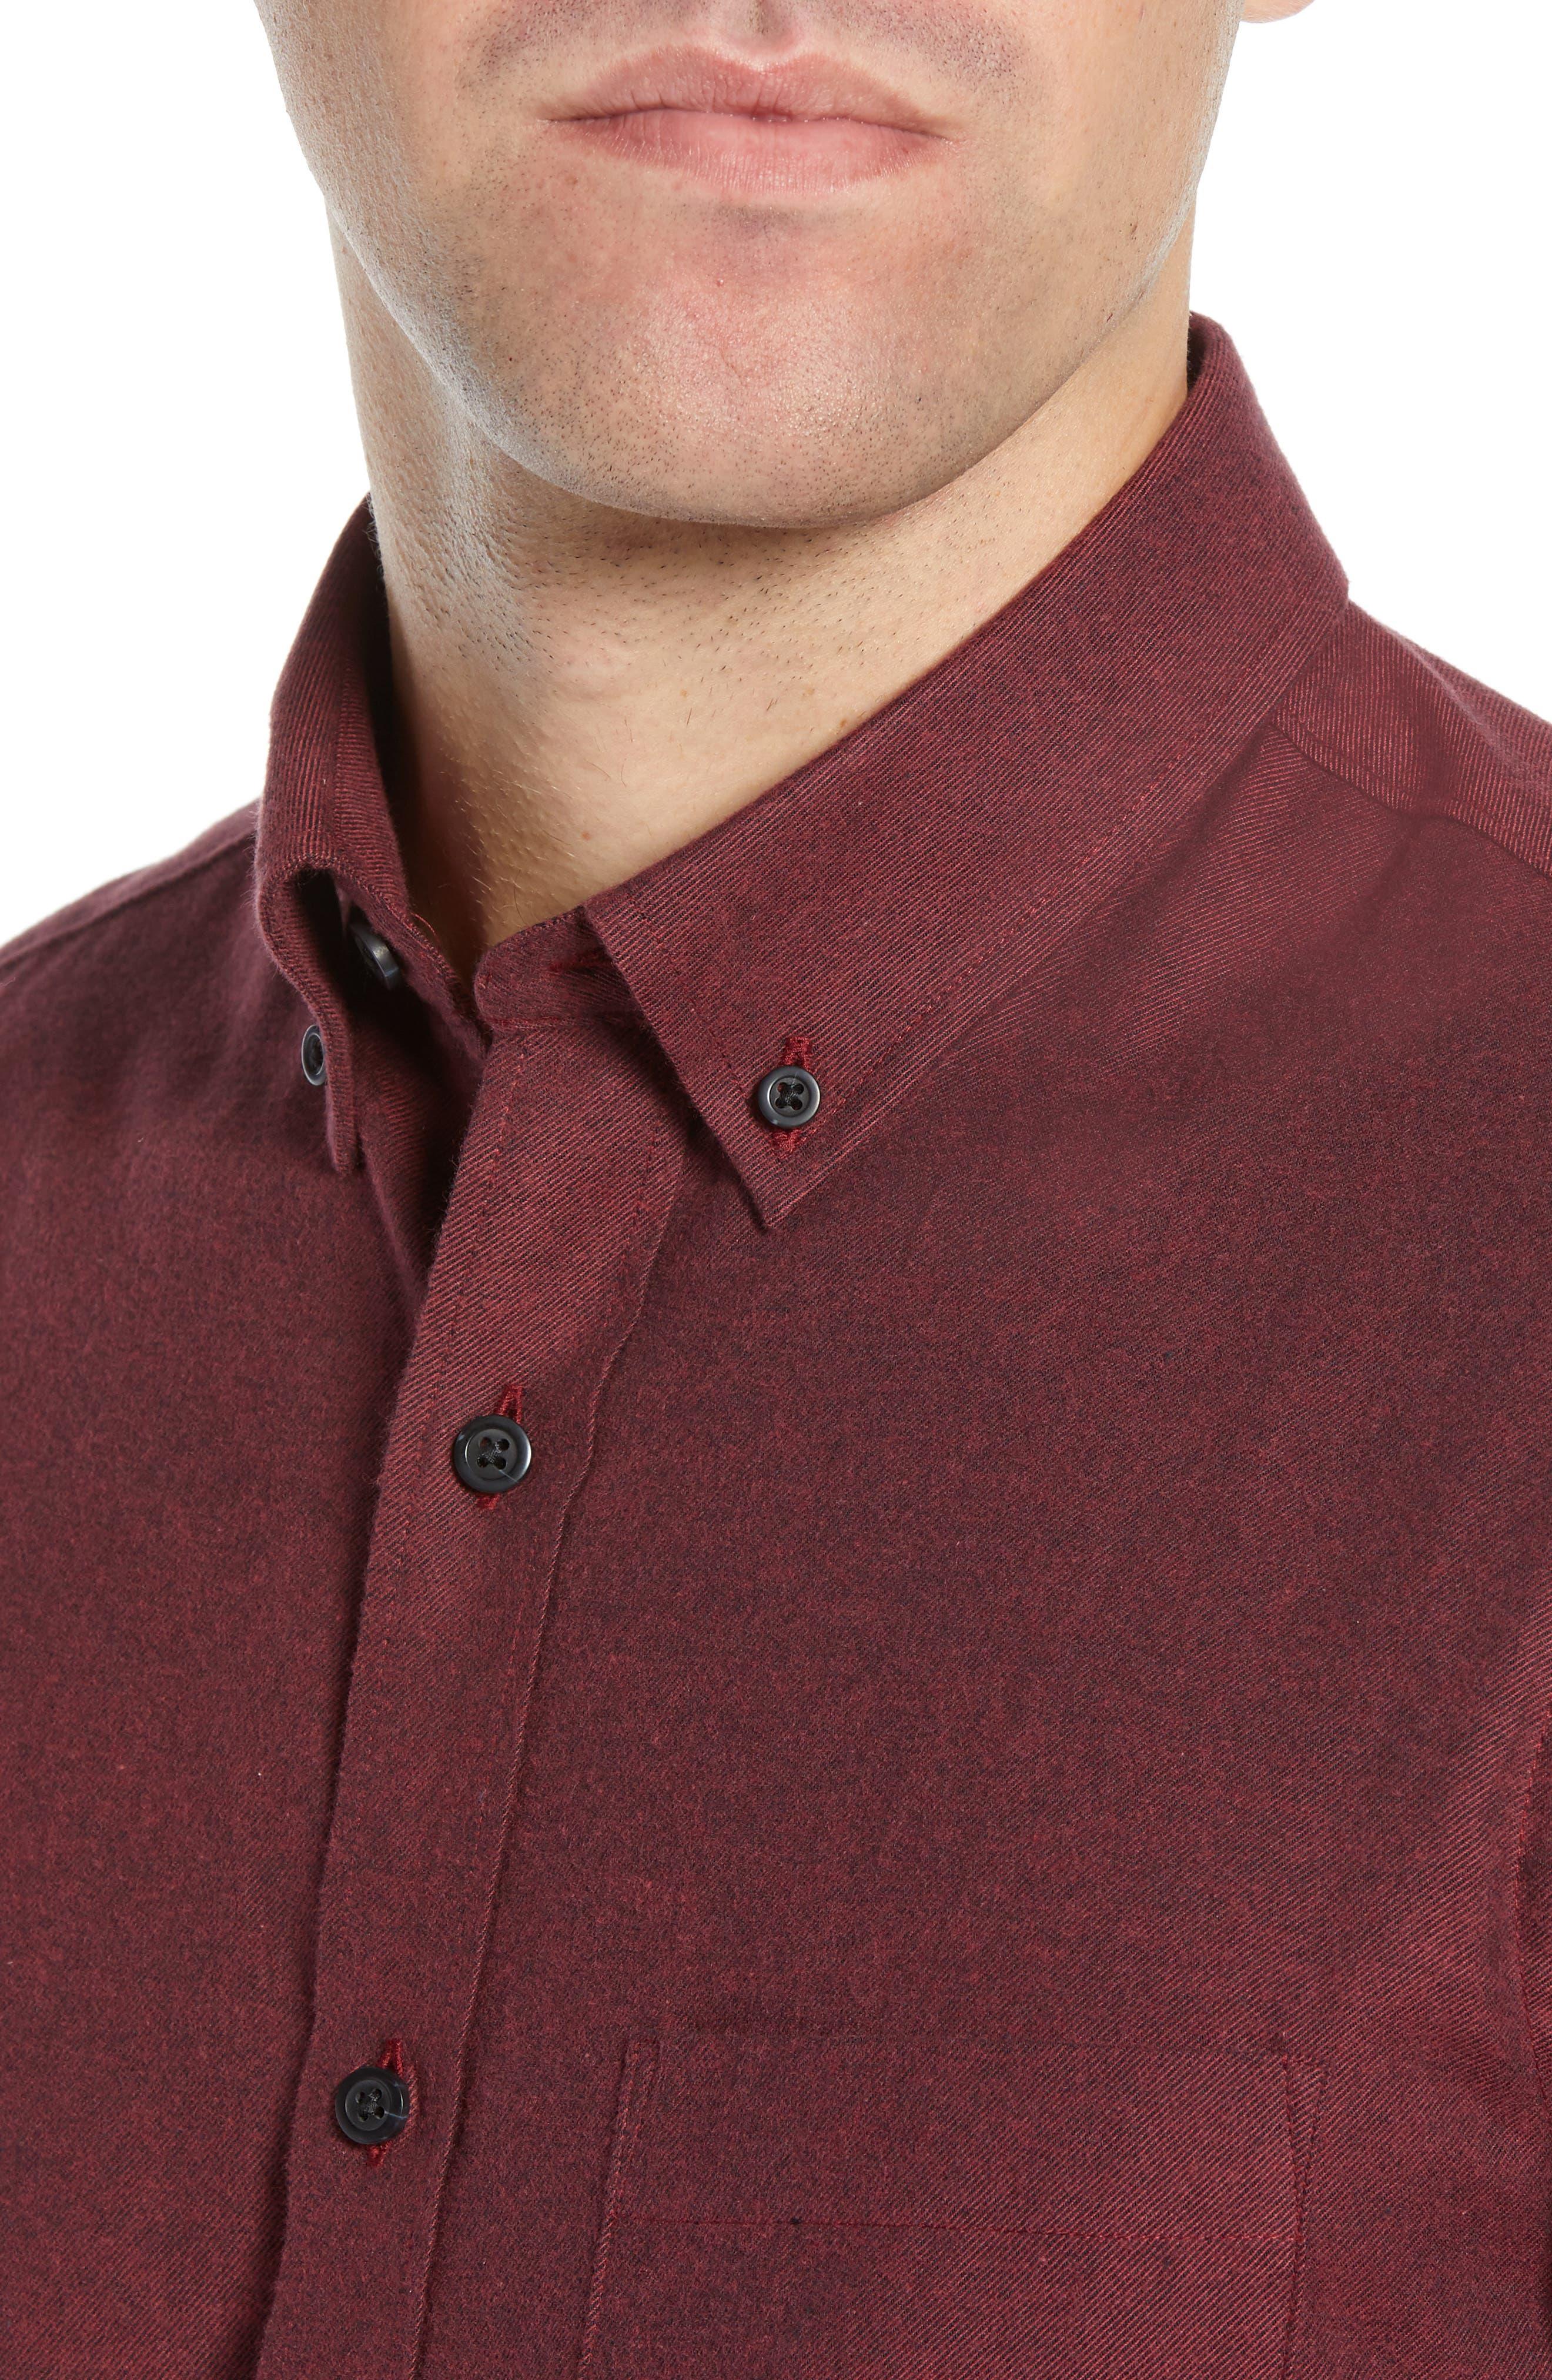 NORDSTROM MEN'S SHOP,                             Slim Fit Brushed Twill Sport Shirt,                             Alternate thumbnail 2, color,                             RED JESTER BRUSHED TWILL